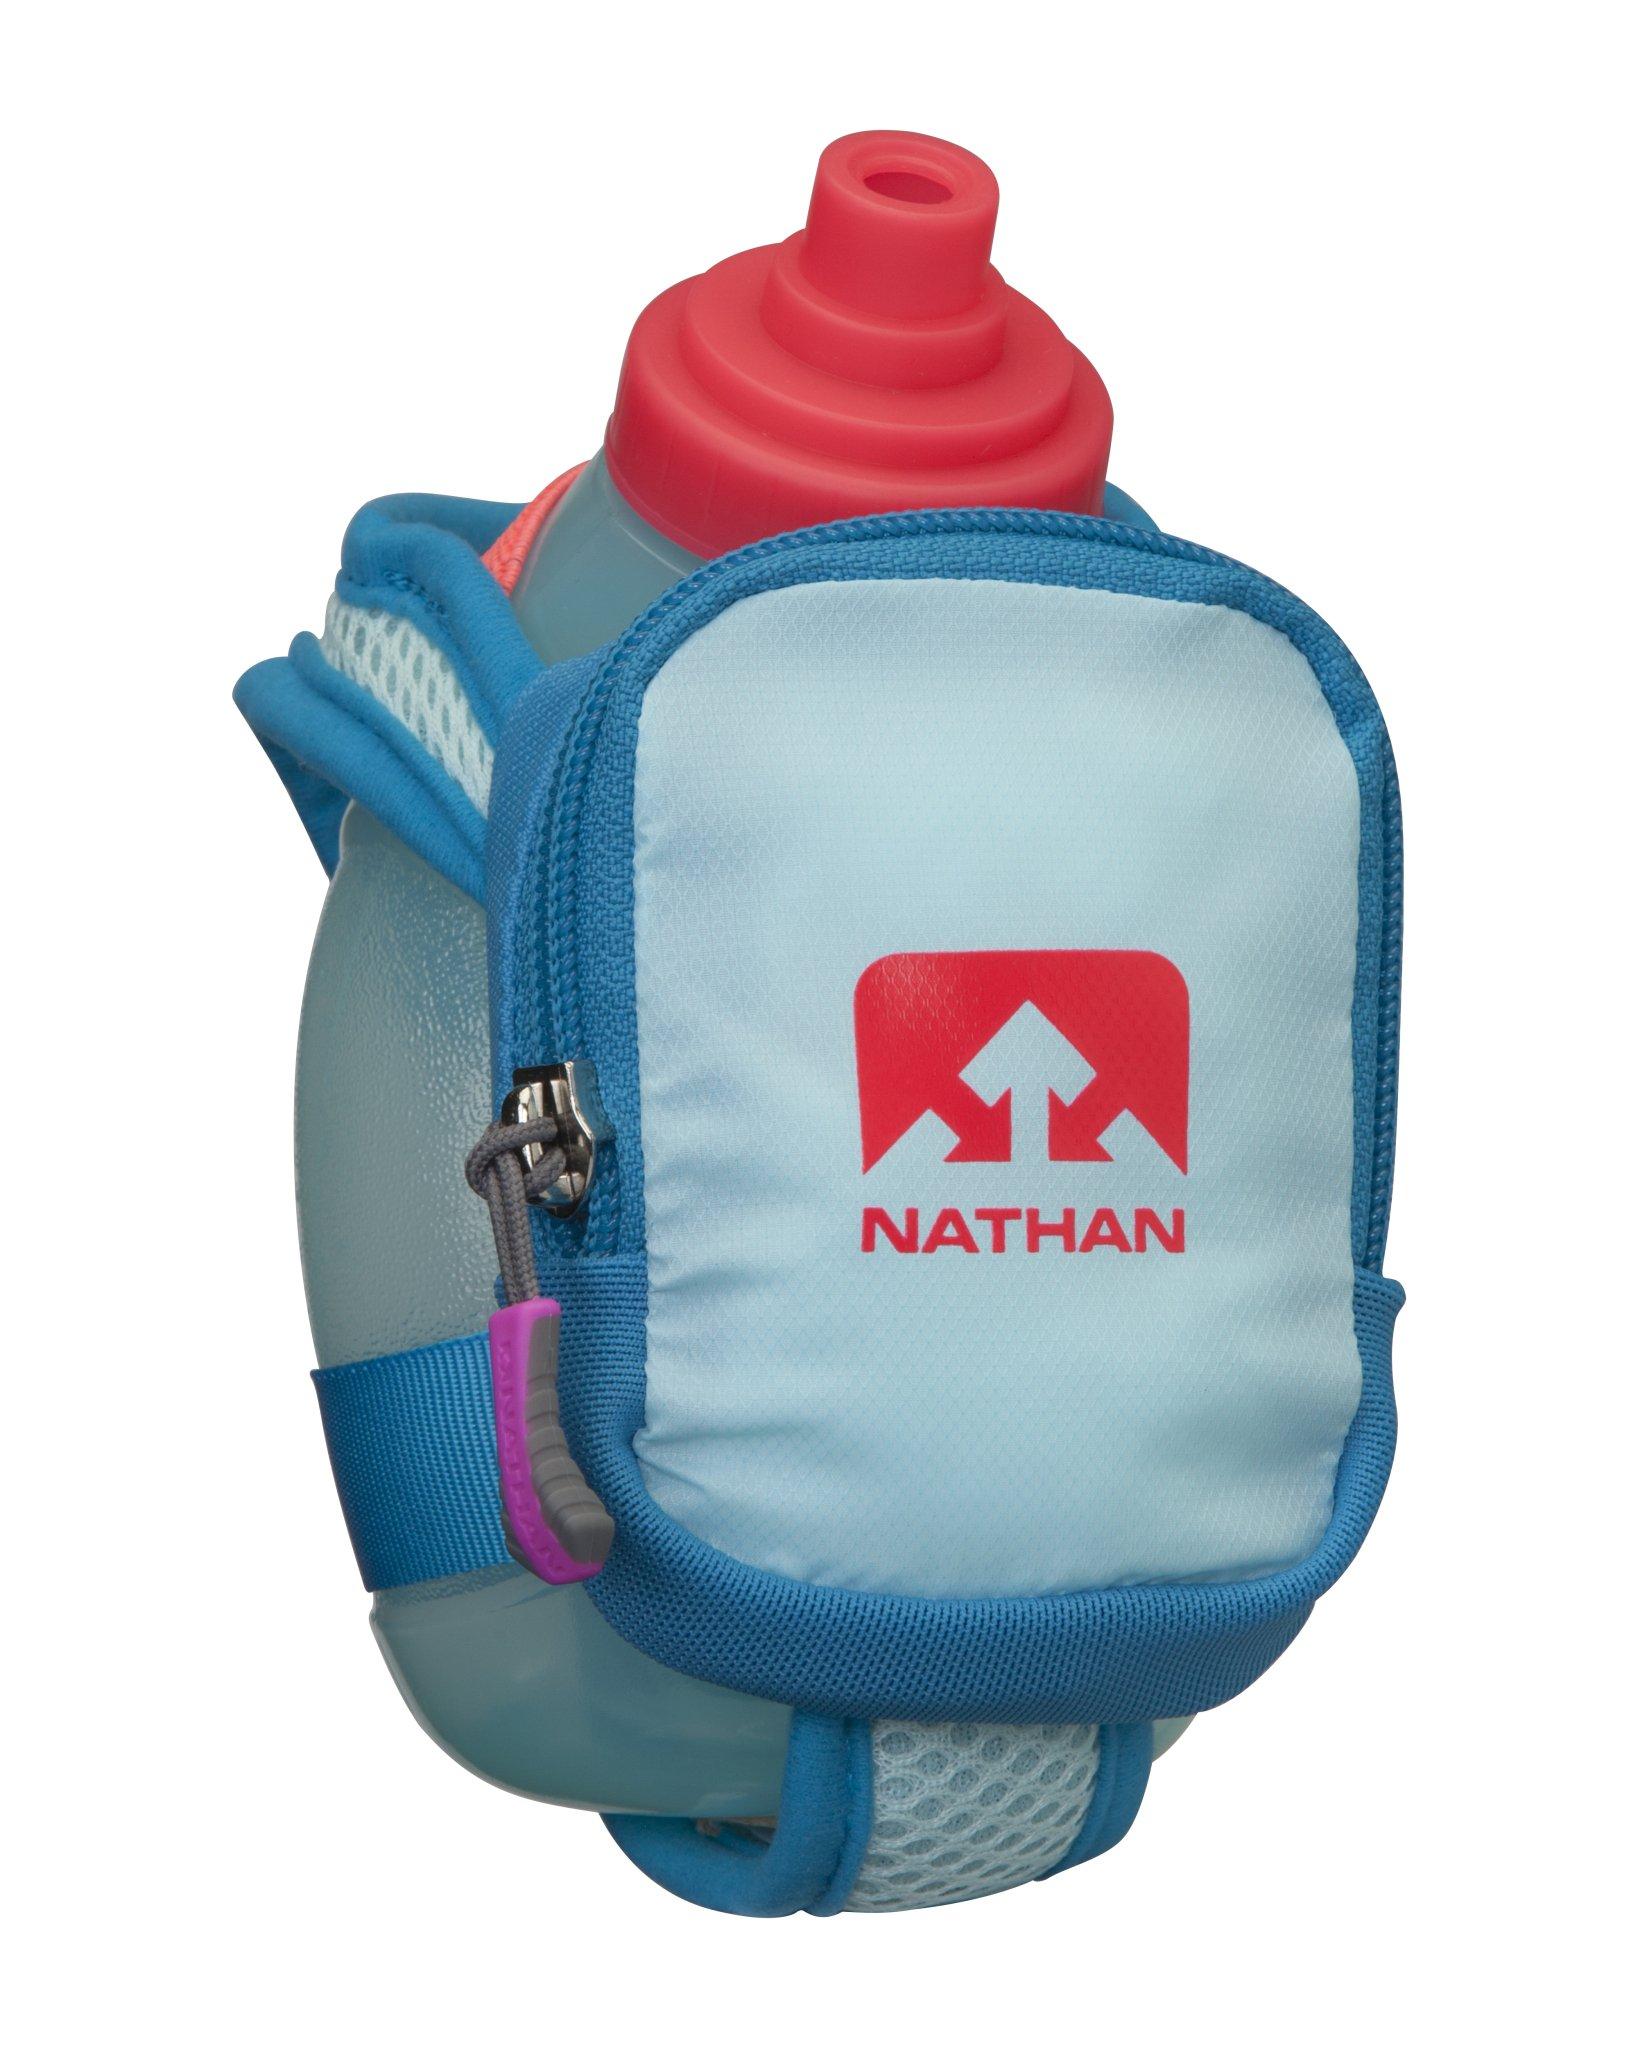 Nathan QuickShot Plus Flask, Blue Danube/Diva Pink, One Size